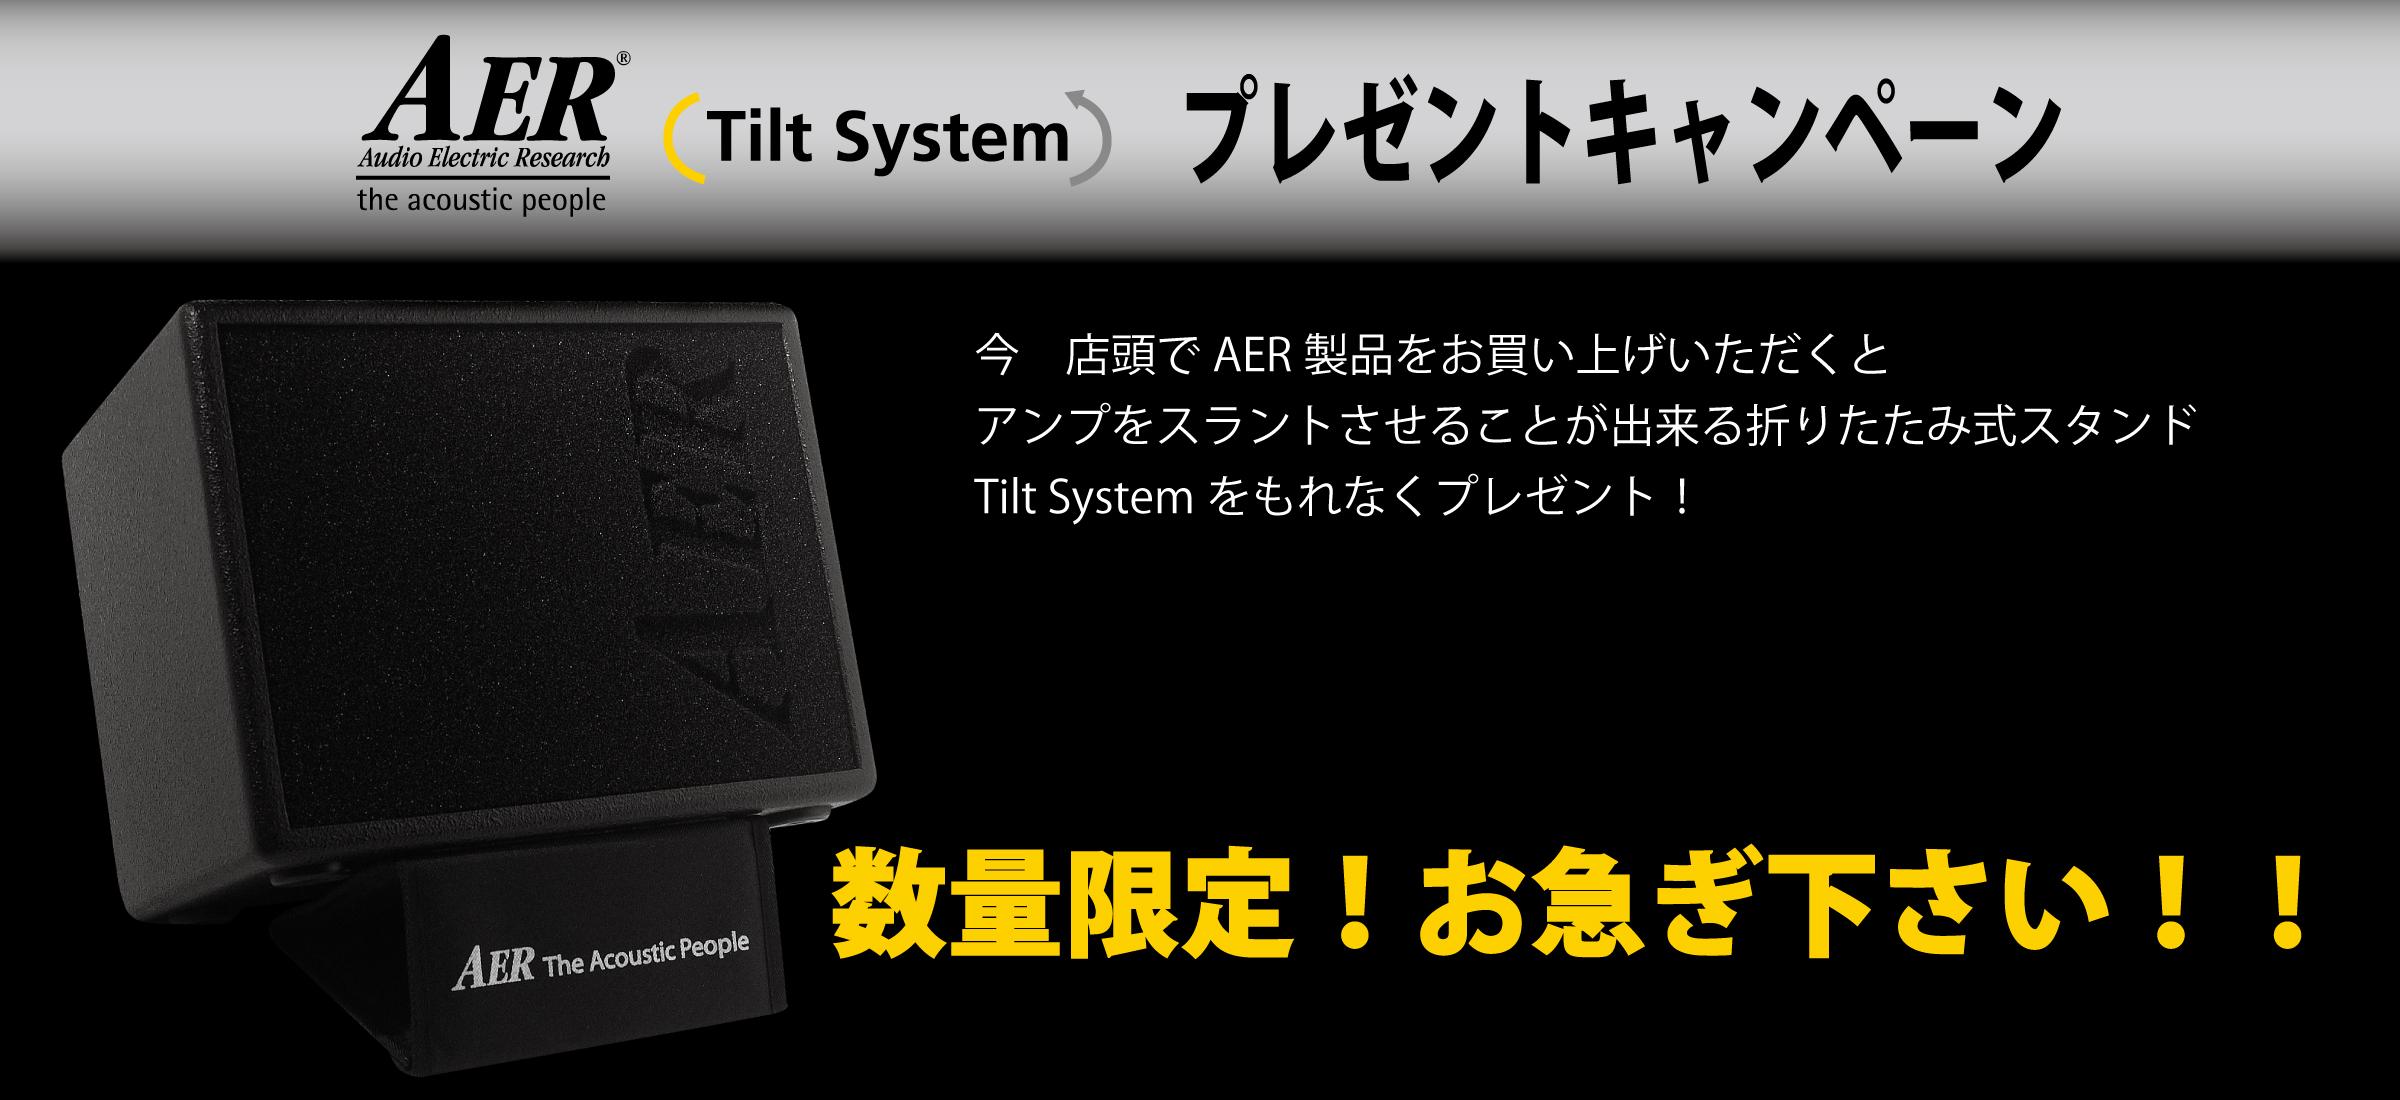 【AER】TILT SYSTEM プレゼントキャンペーンのお知らせ